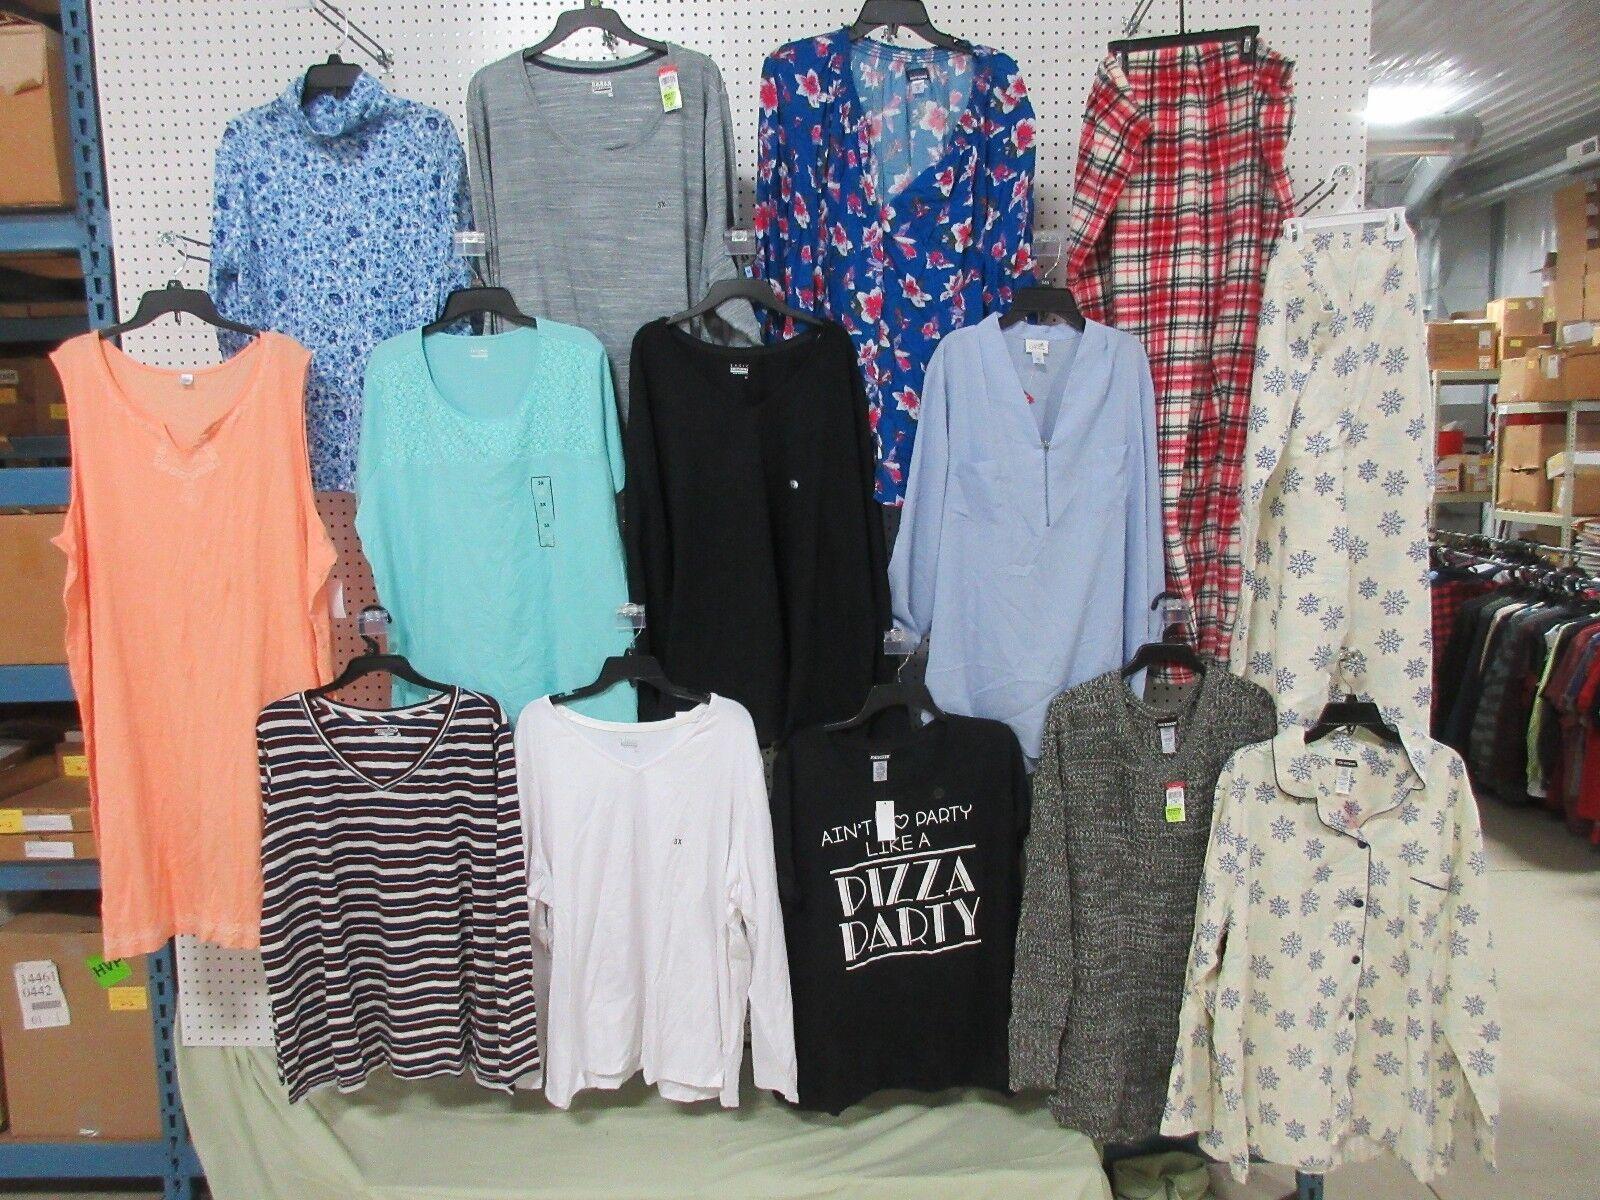 13 damen 3XL TOPS CLOTHES BLOUSES SHIRTS LONG SHORT SLEEVE SWEATER PANTS LOT